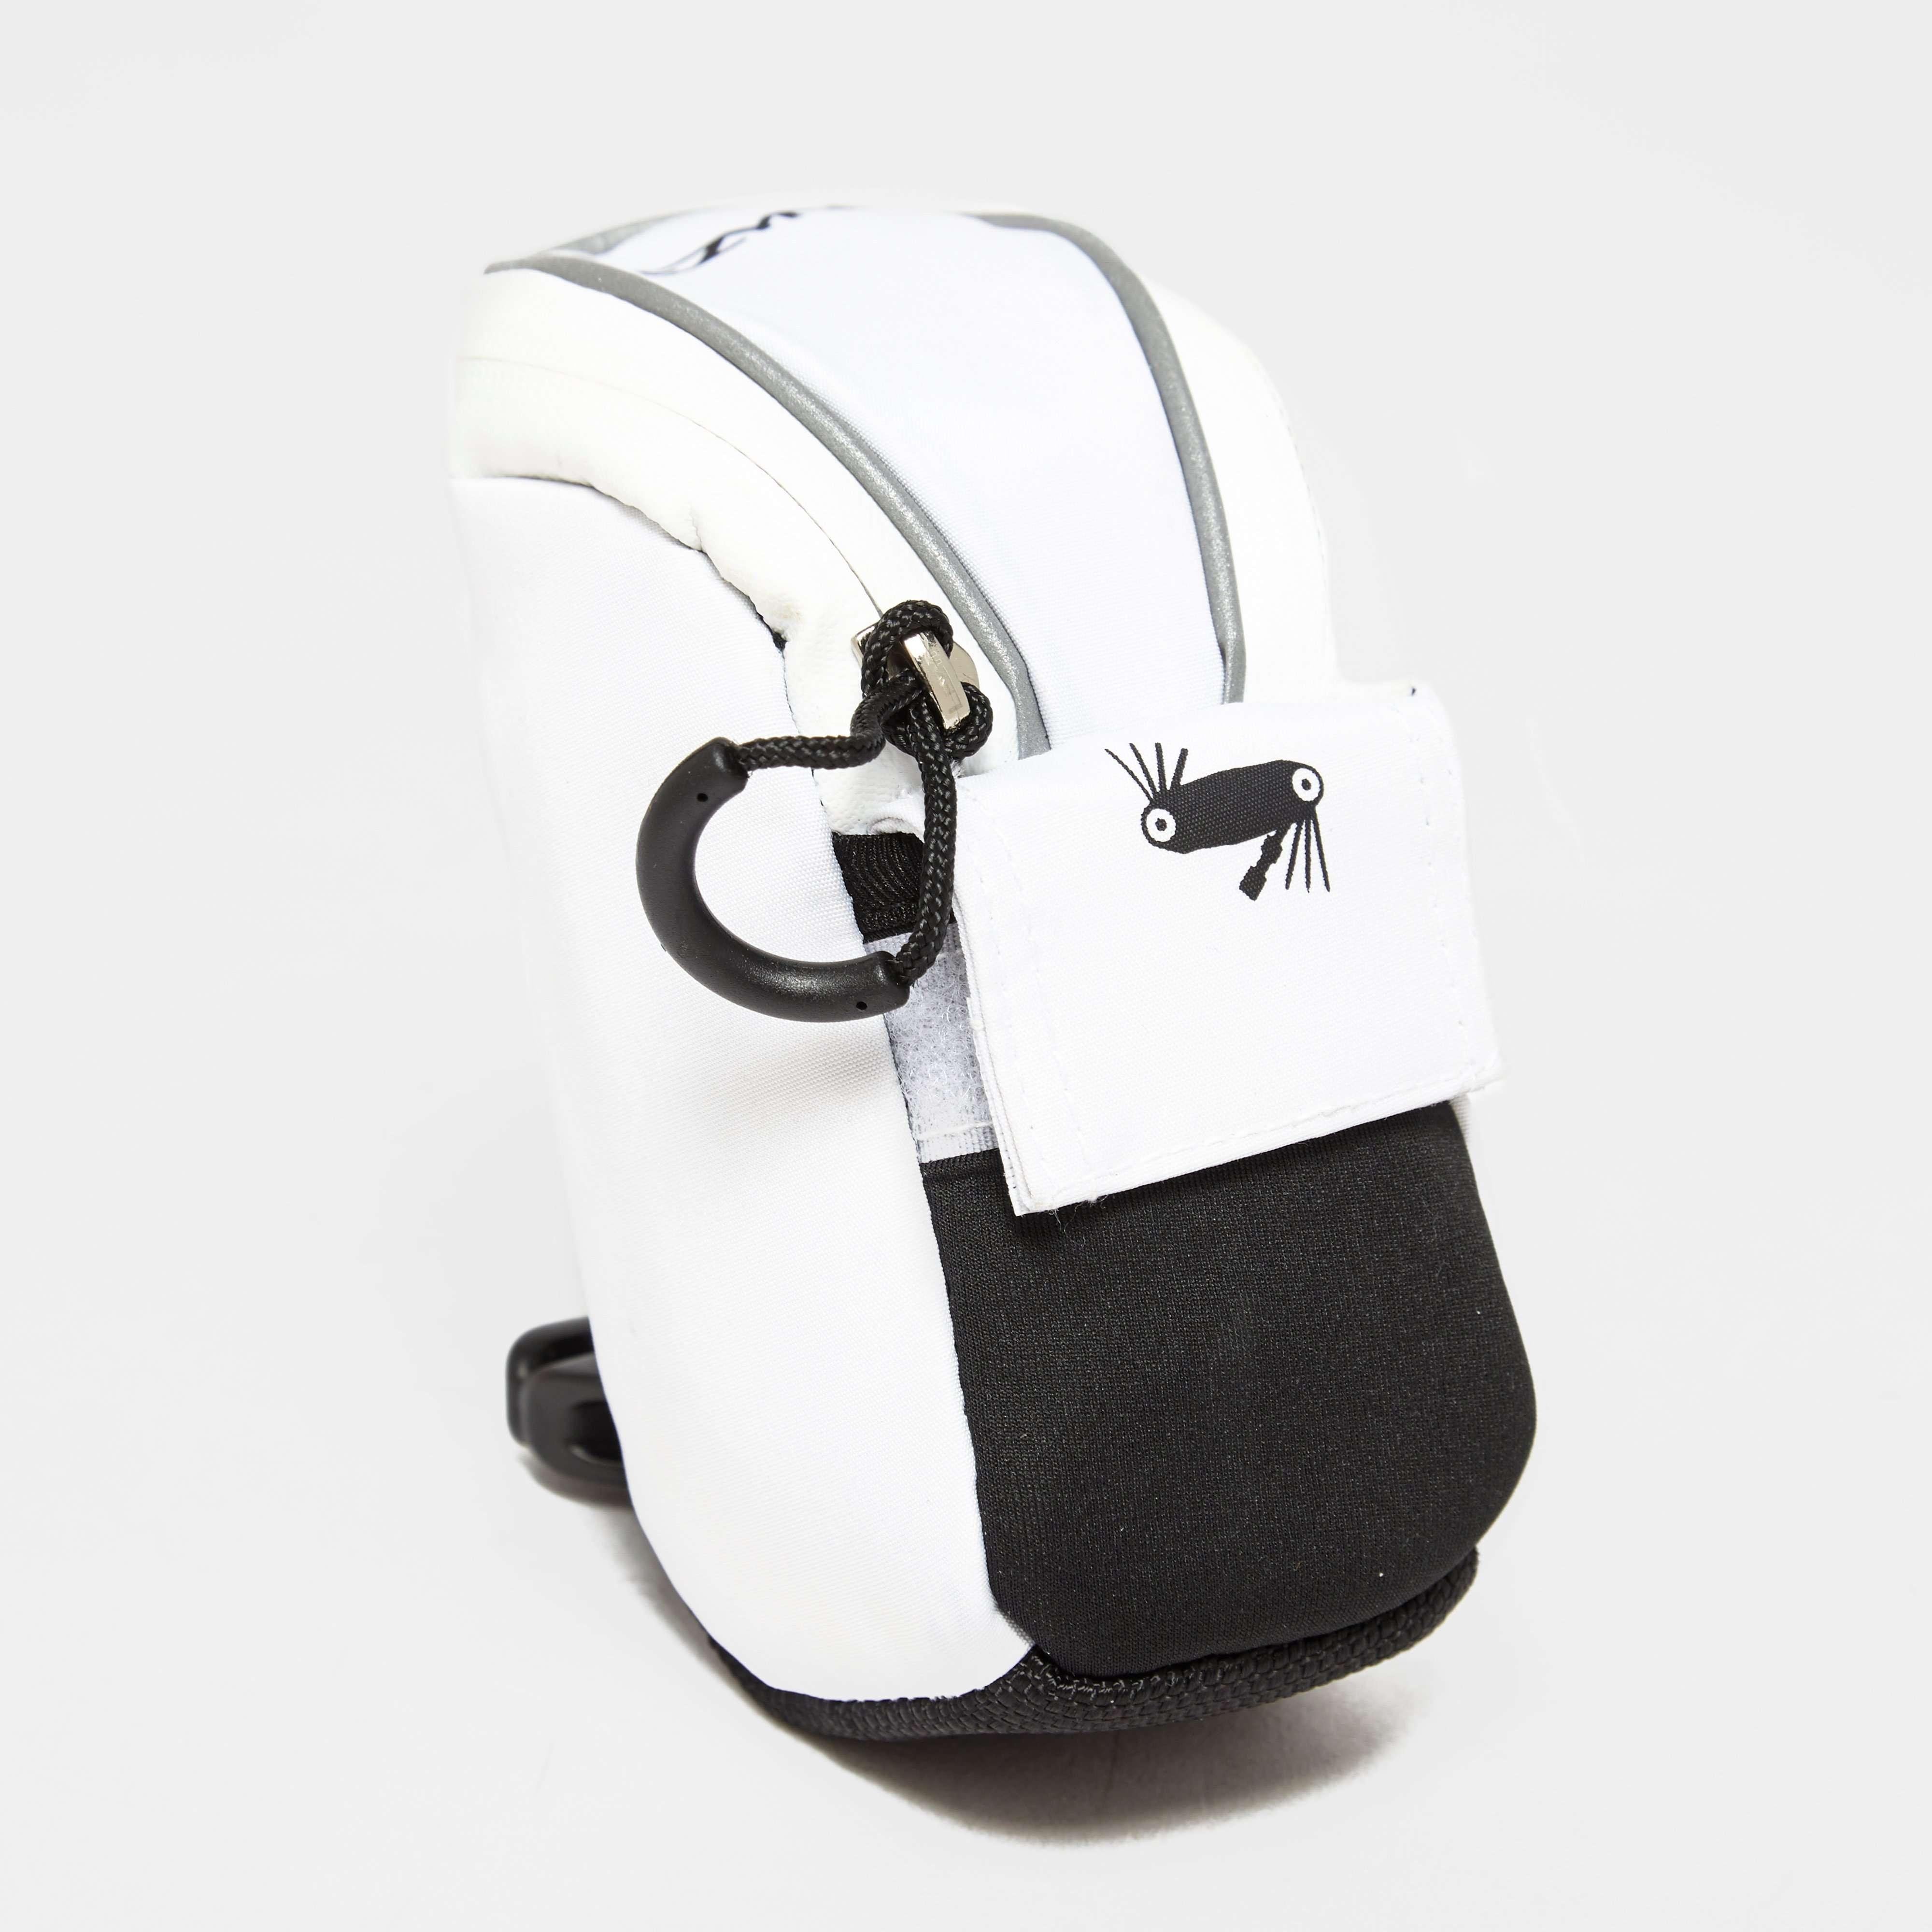 LEZYNE Micro Caddy QR Saddle Bag - Medium